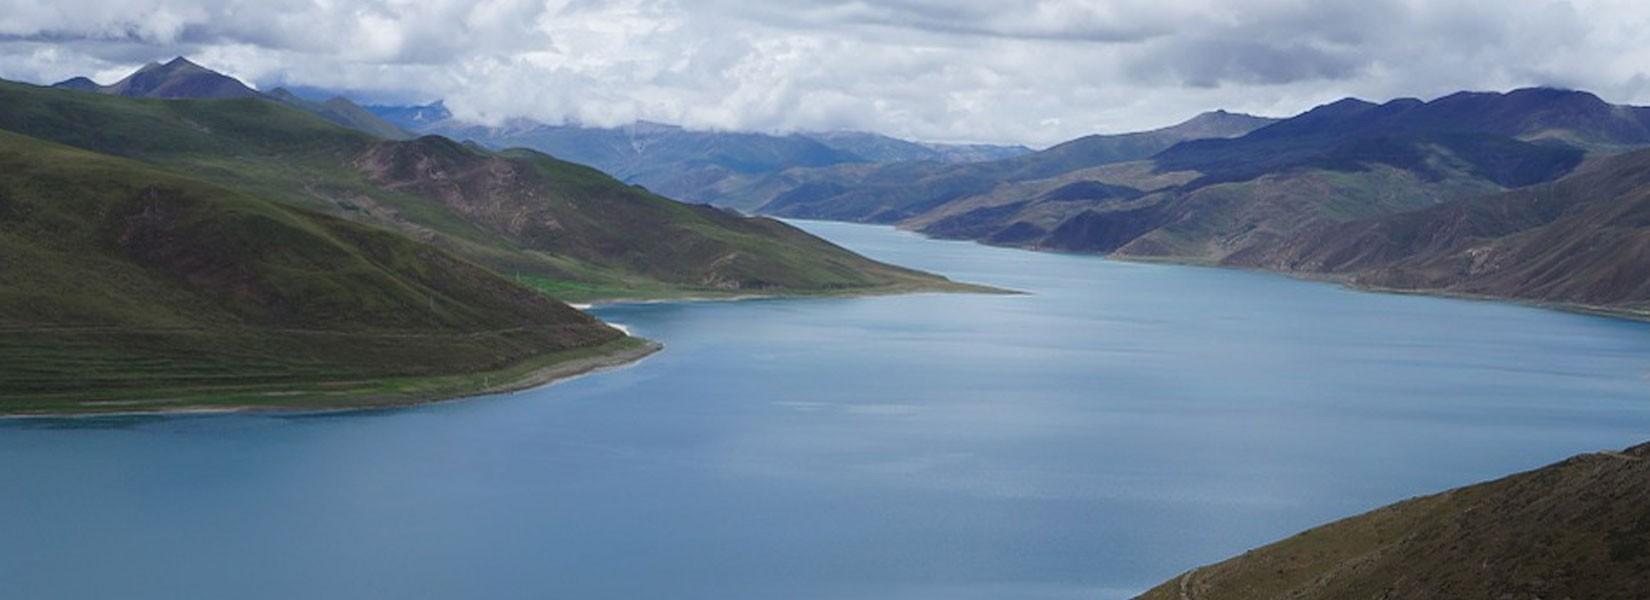 Mt. Kailash Journey